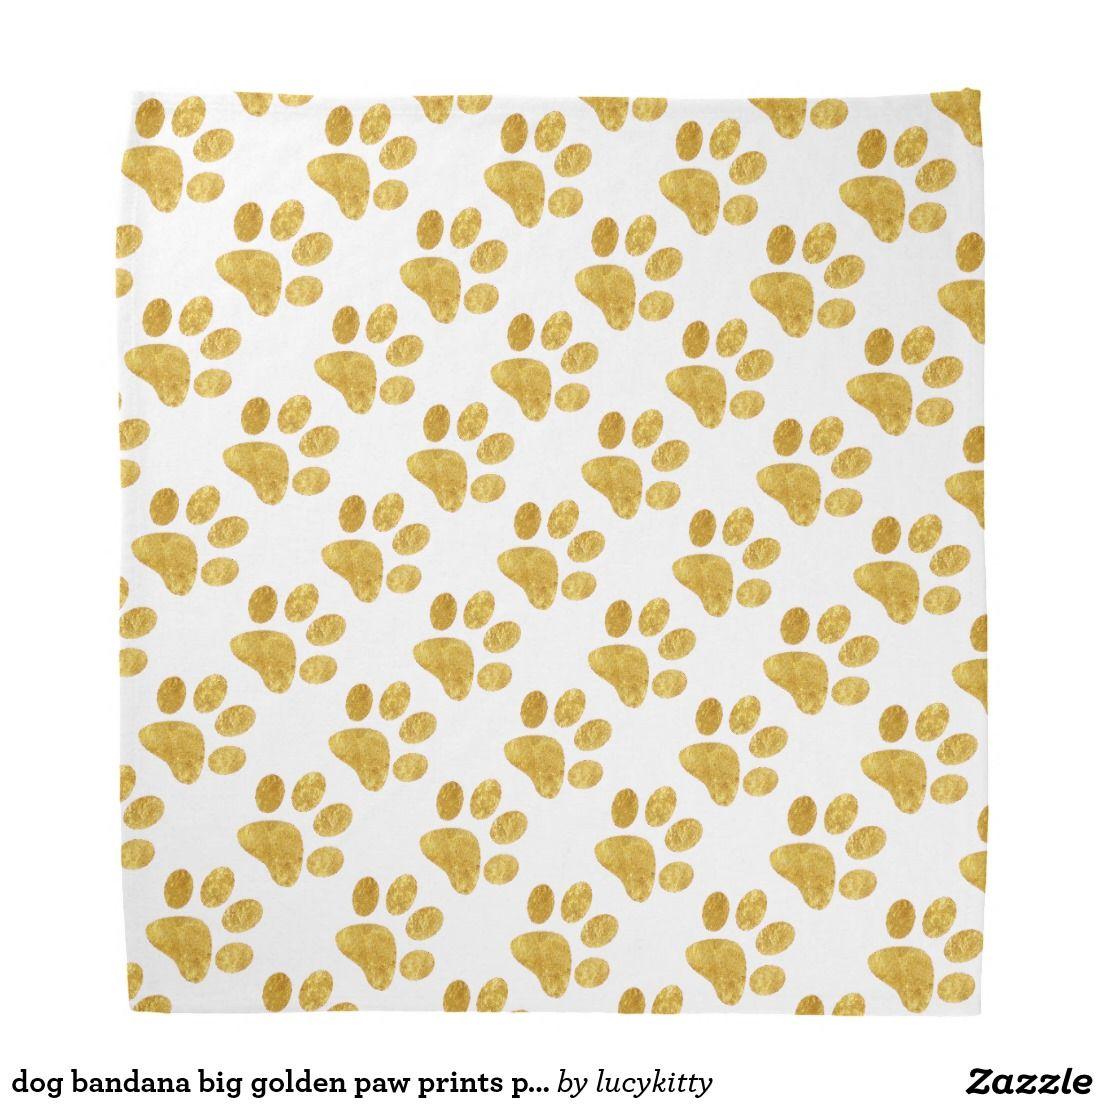 dog bandana big golden paw prints pattern